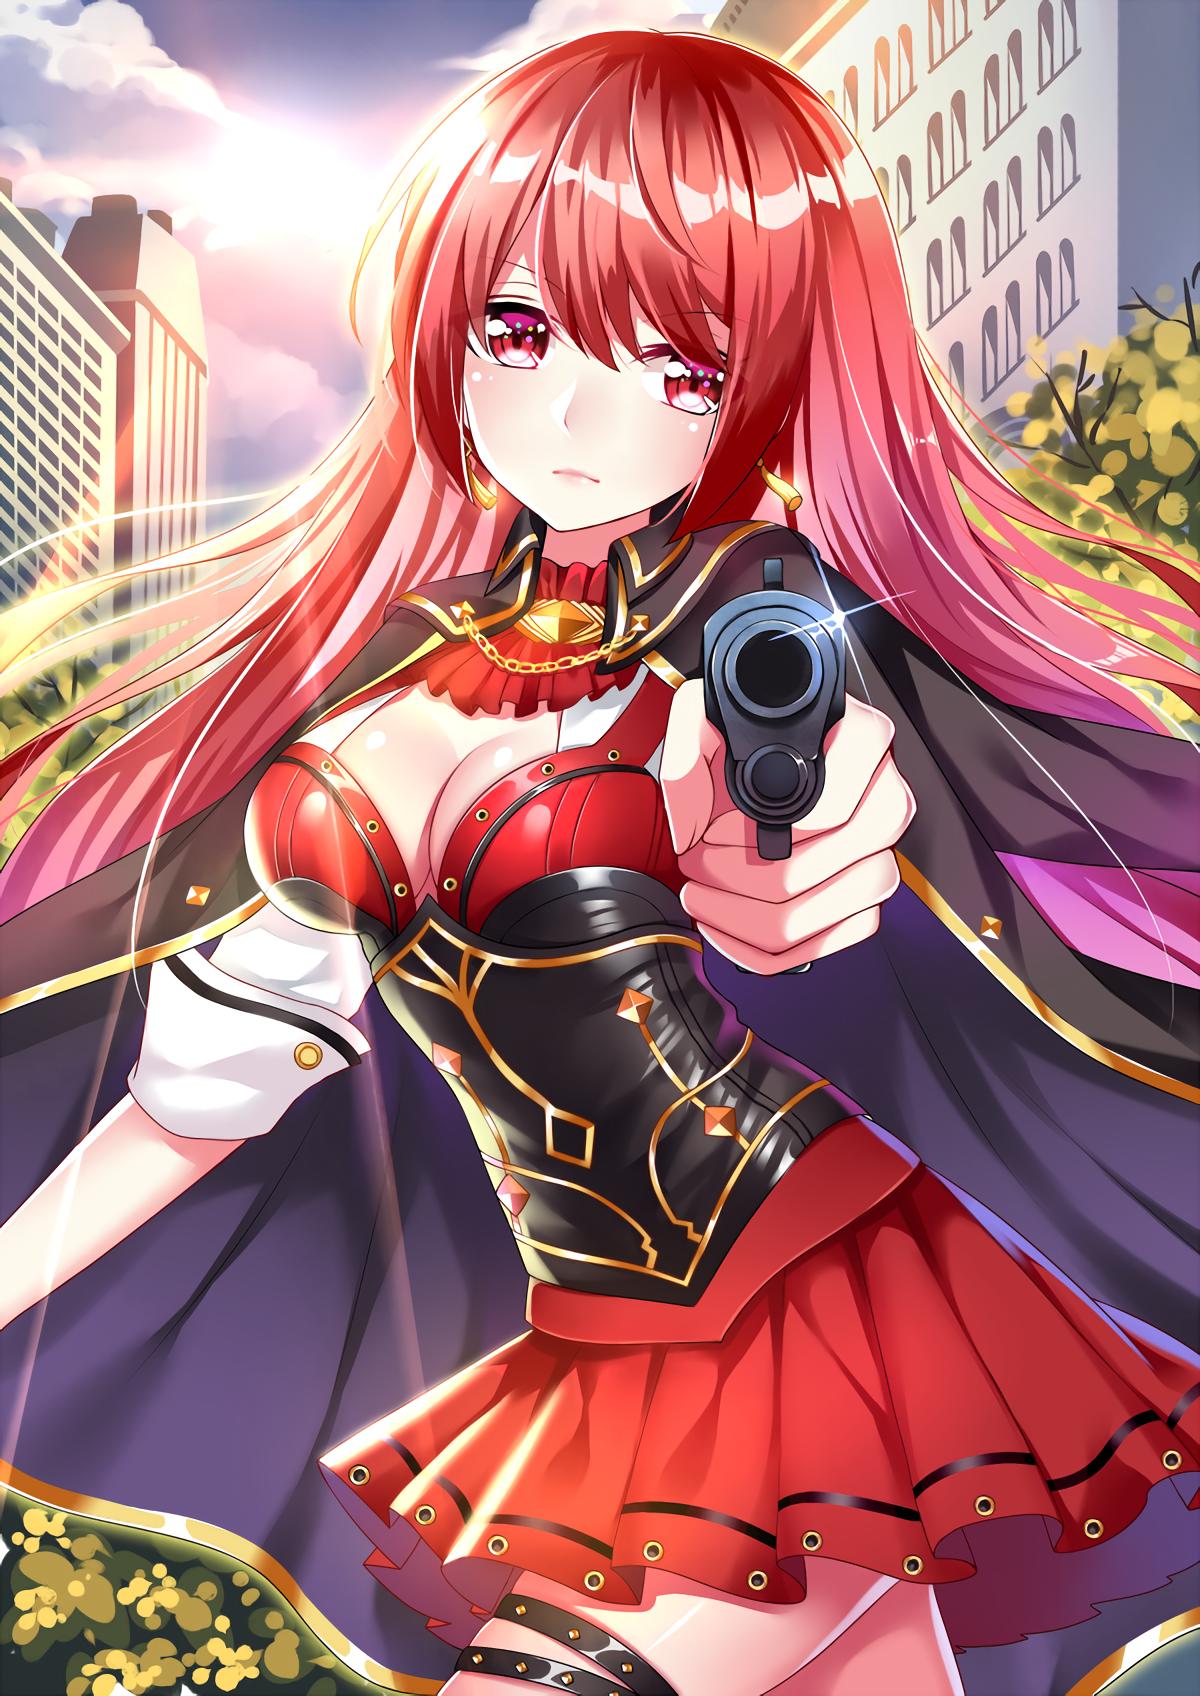 Wallpaper : anime girls, open shirt, gun, weapon, long